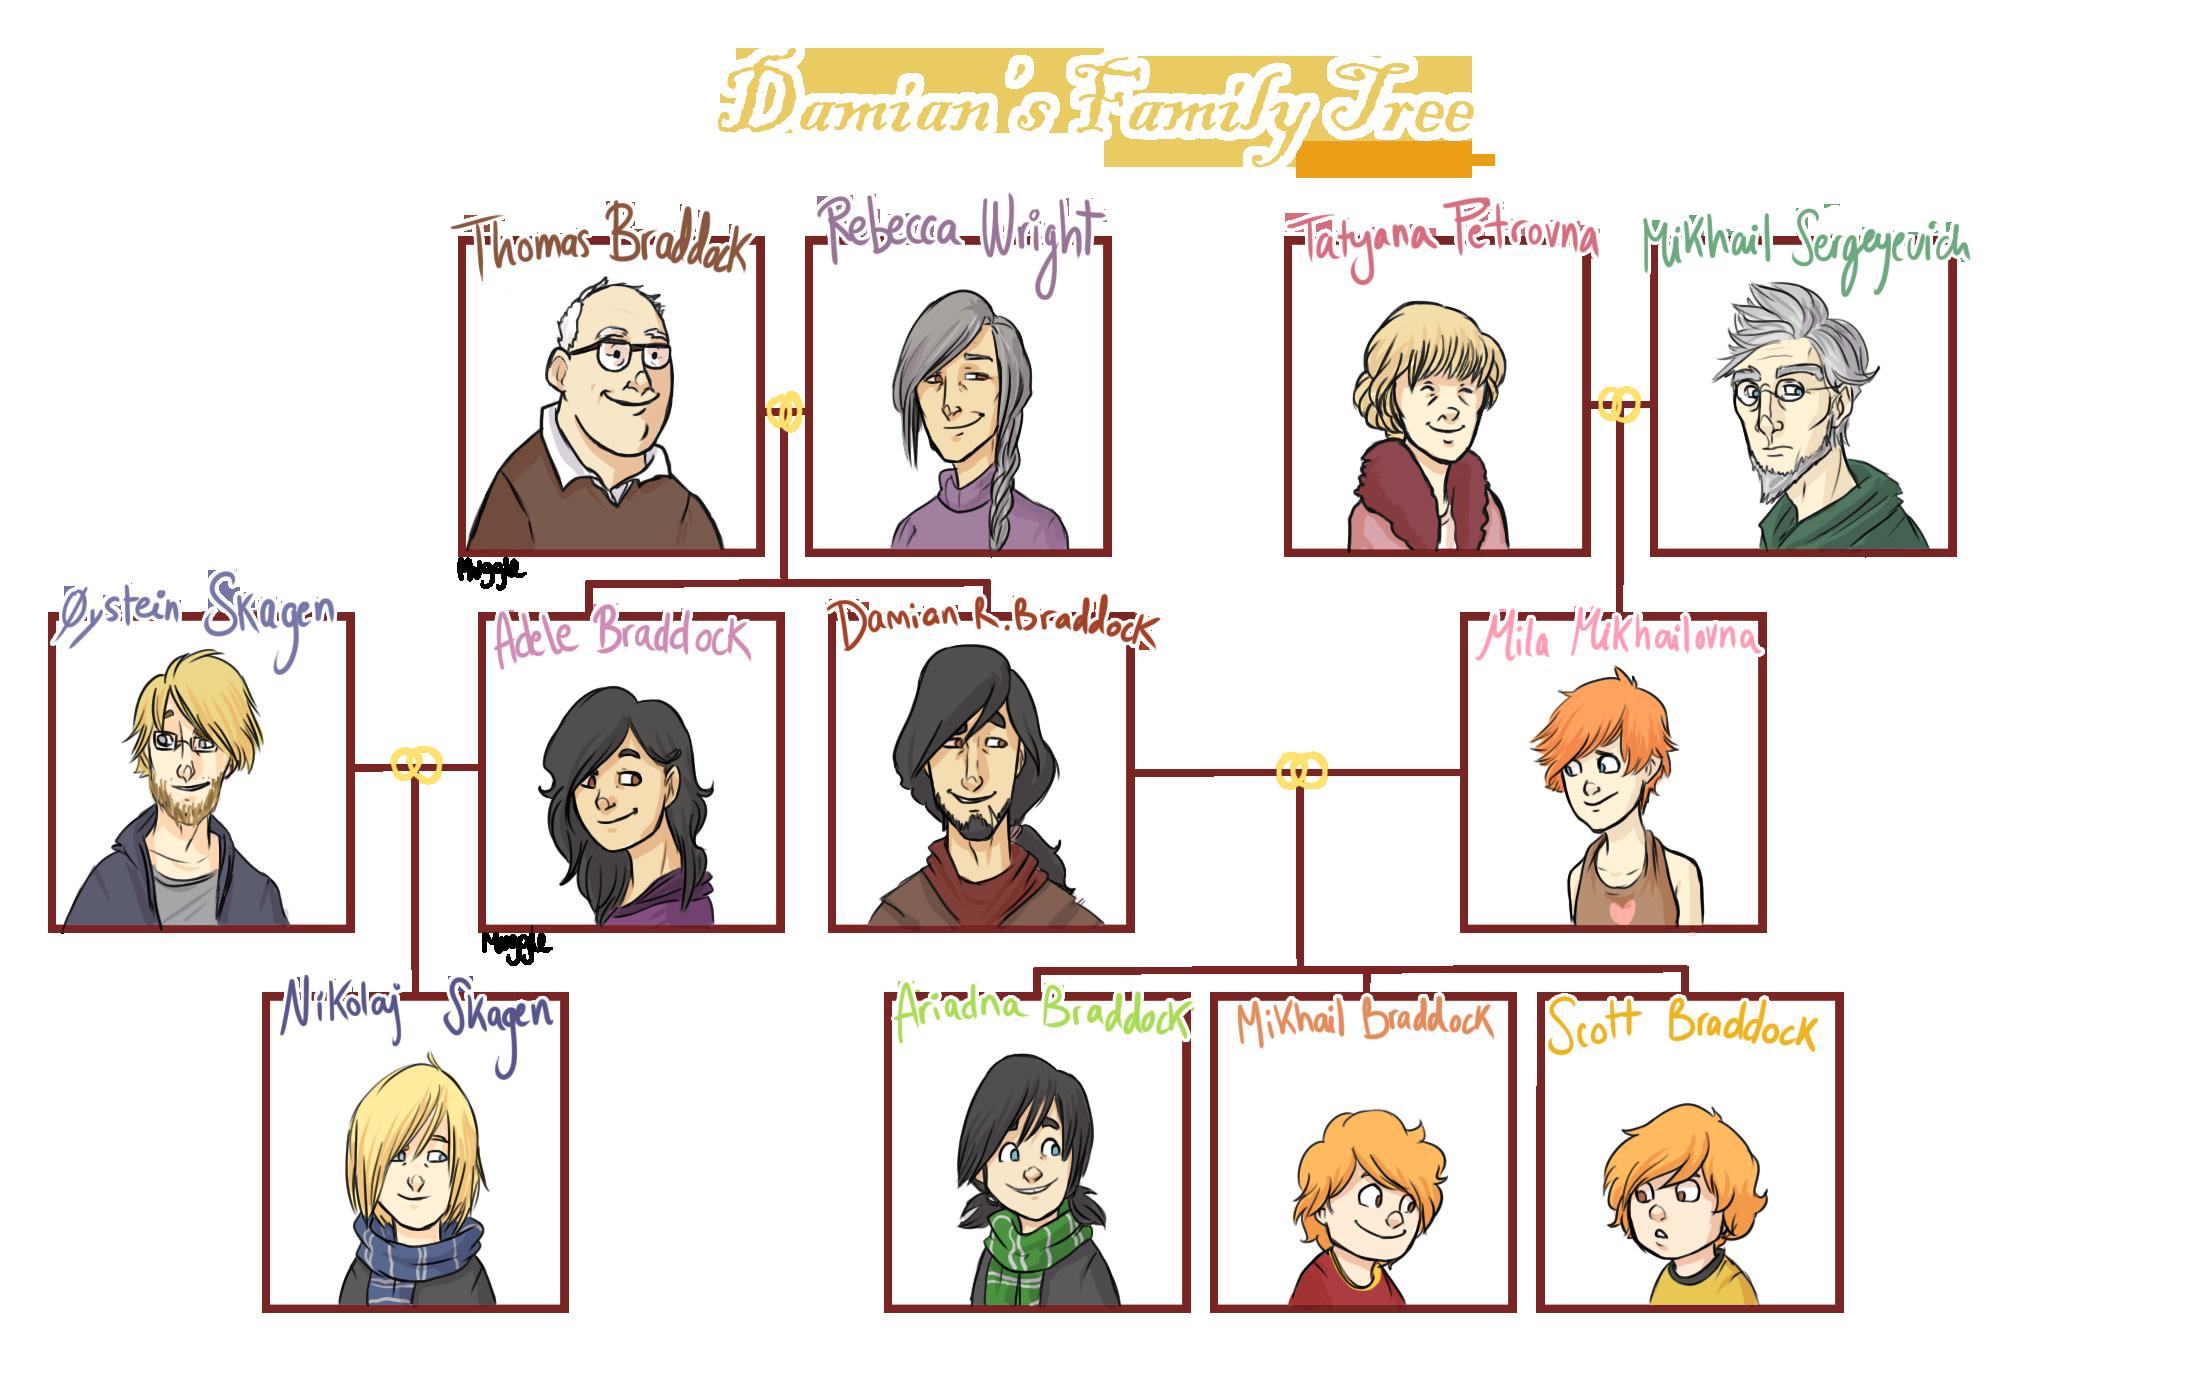 Simple Spanish Family Tree